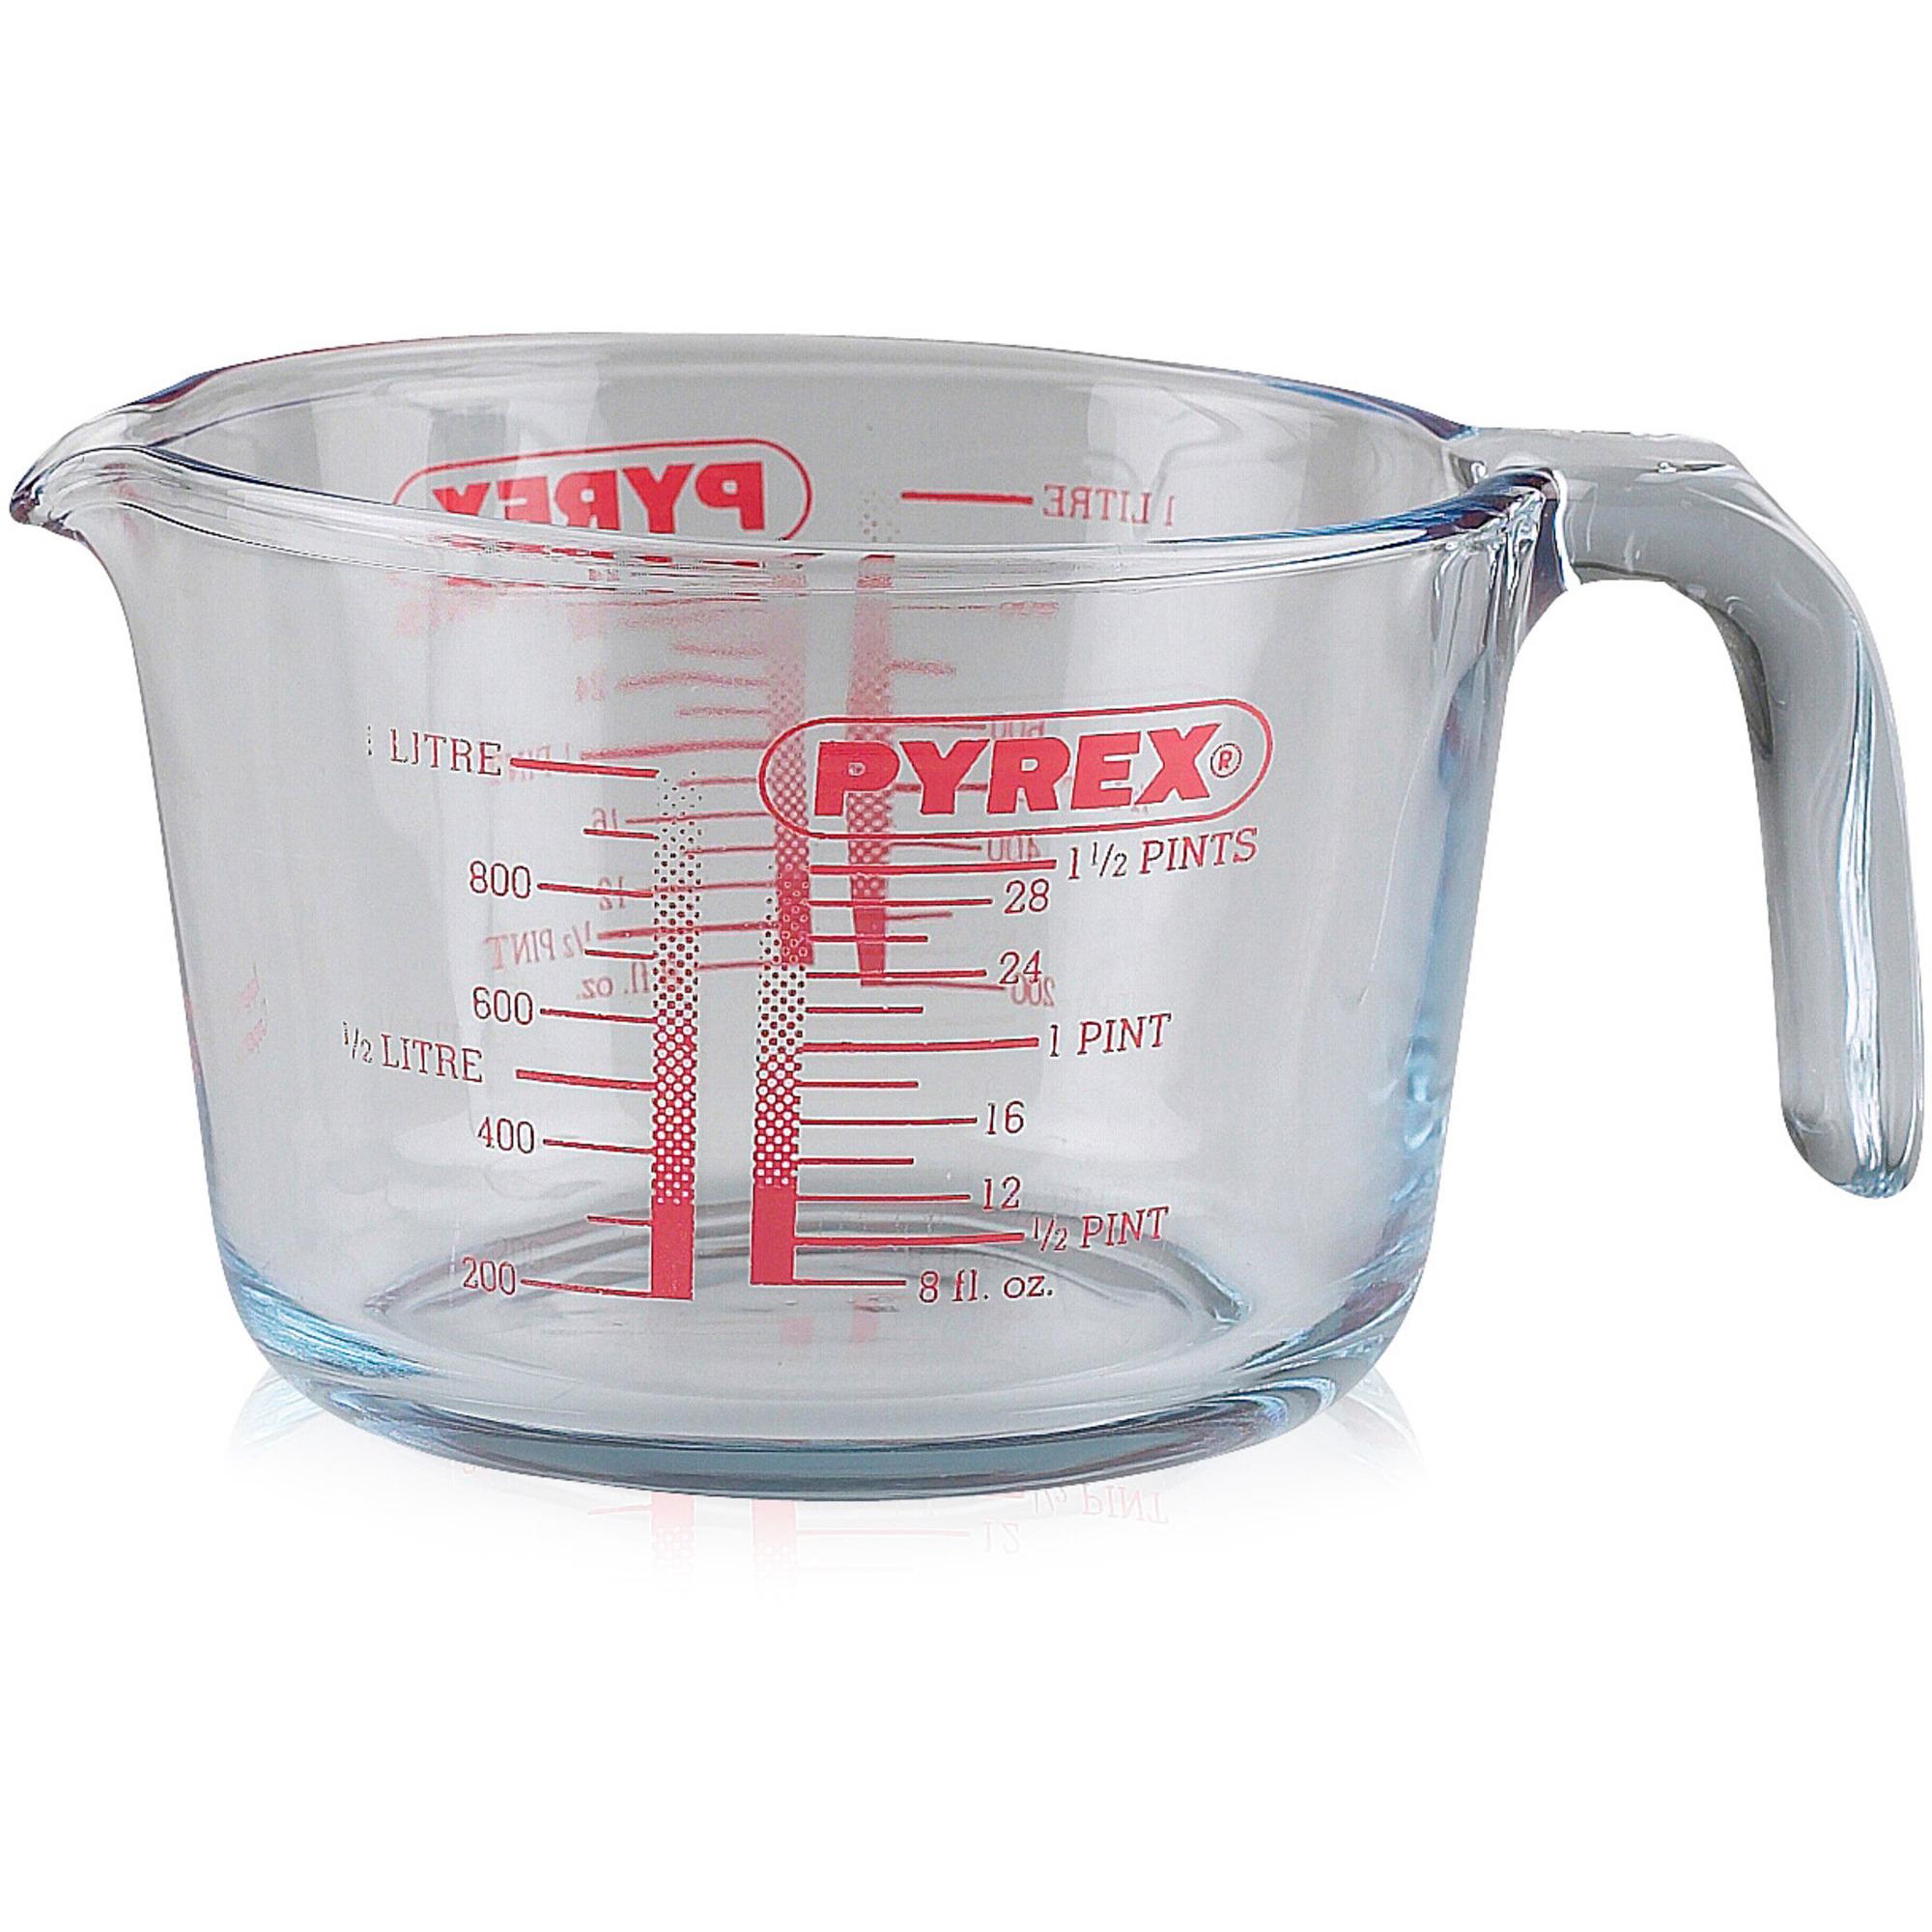 Pyrex Måttbägare i glas 1 liter